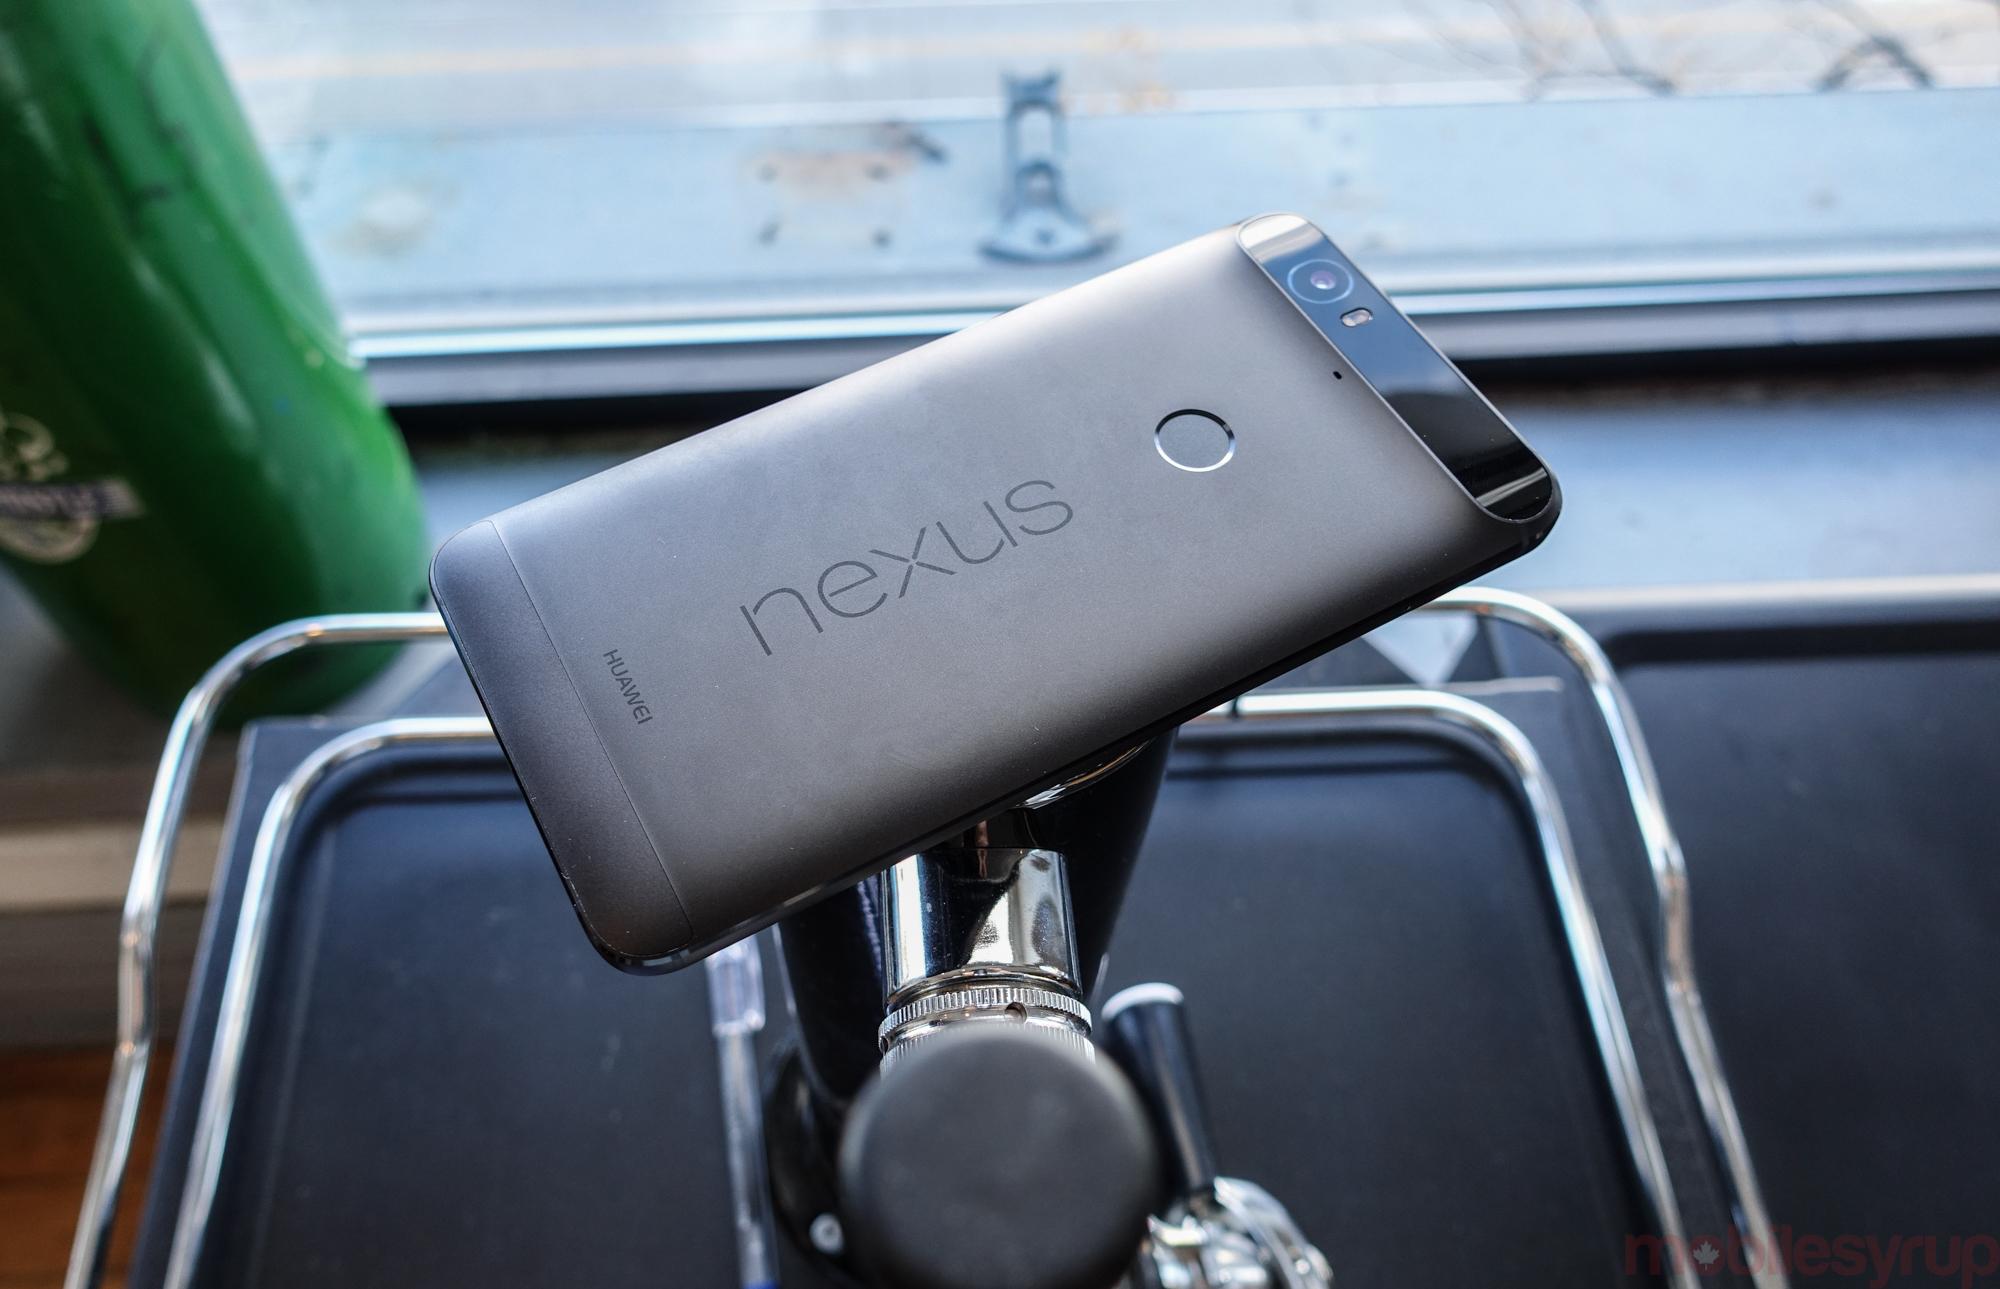 nexus6preview-01560